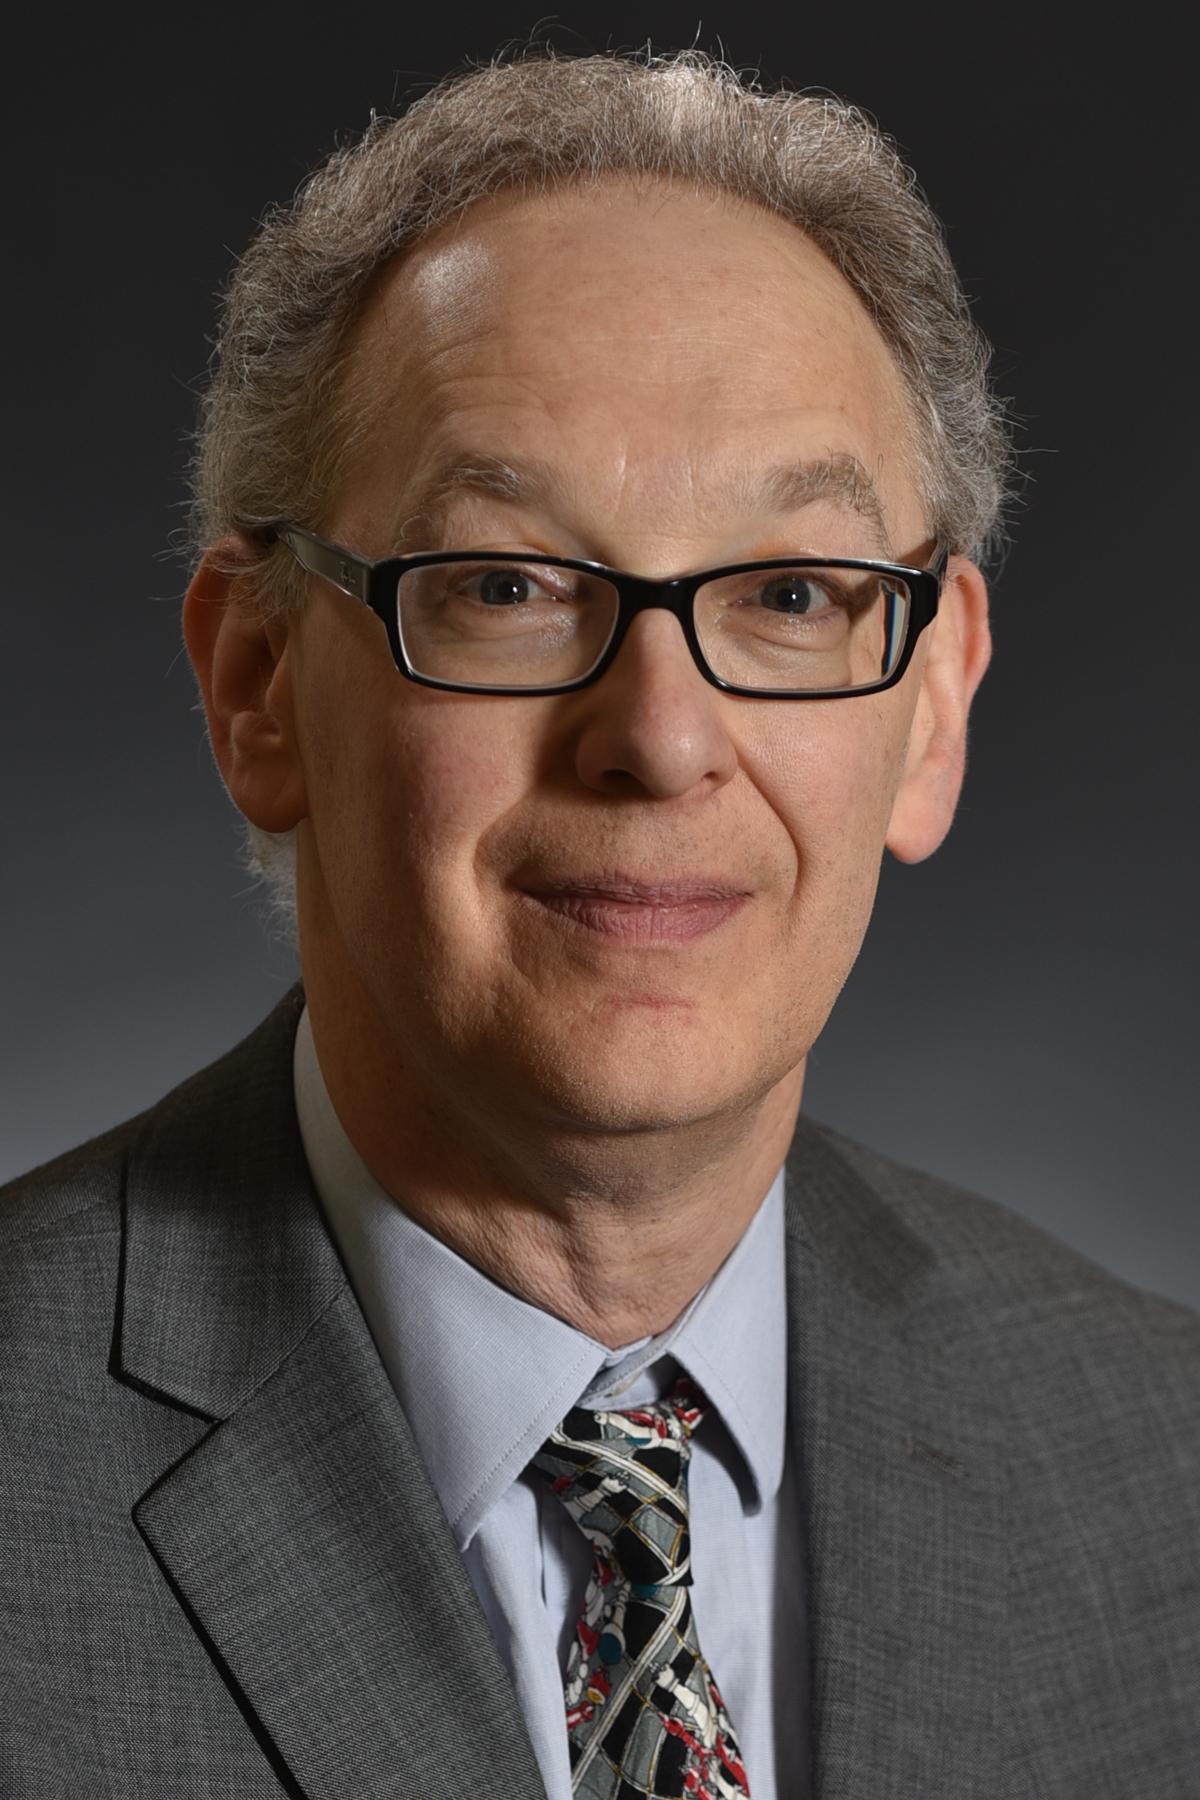 Dr. Philip Baer